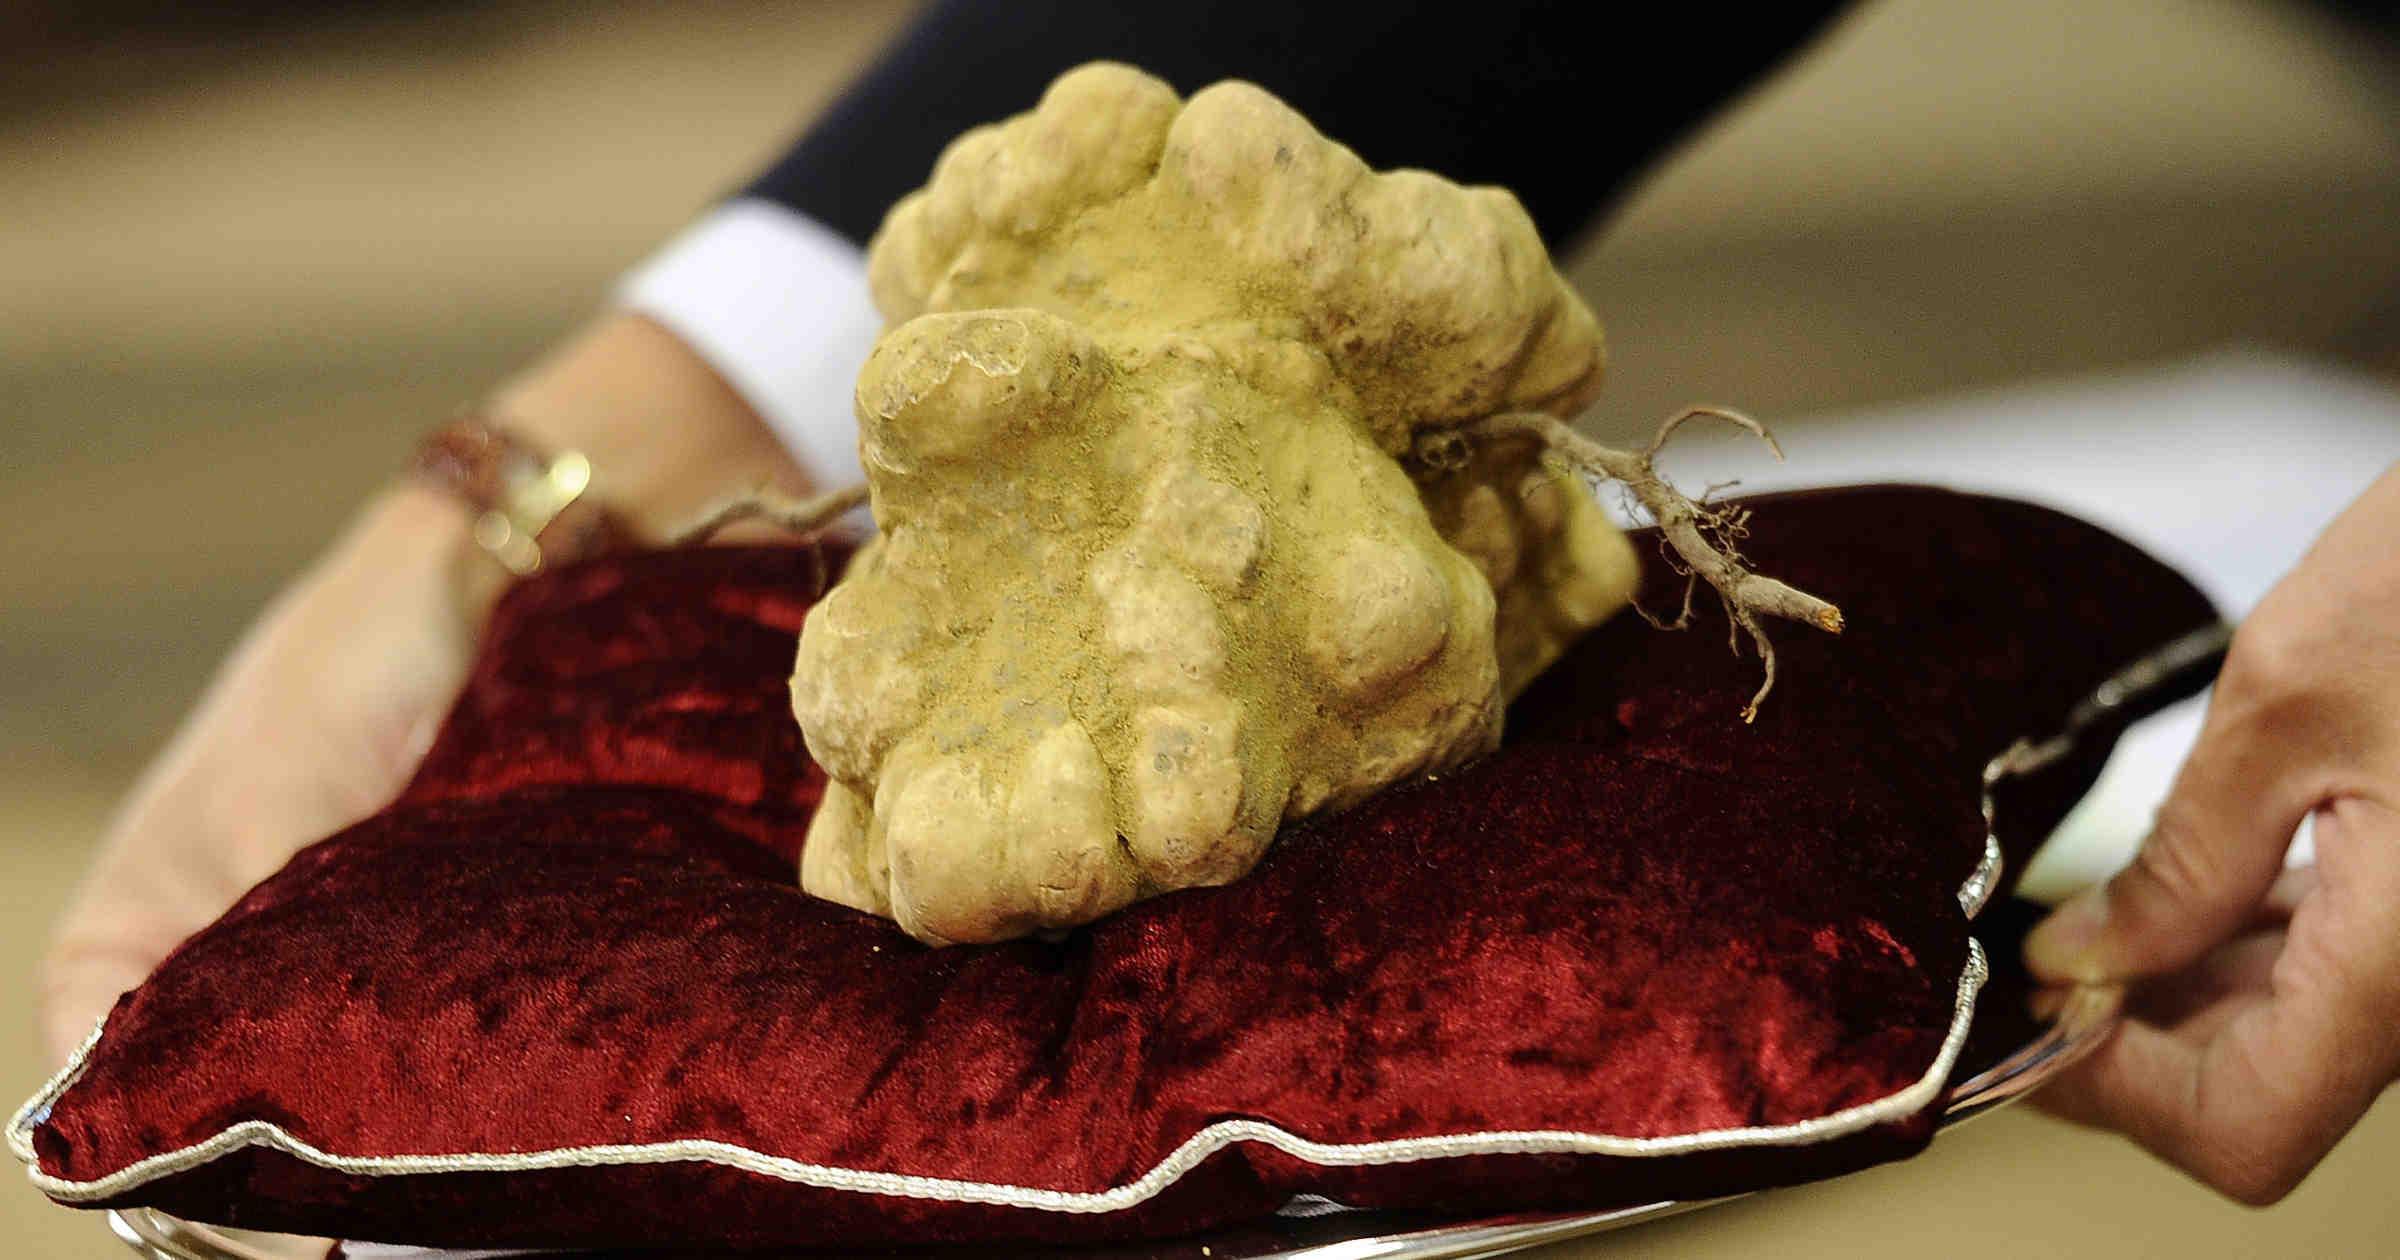 's Werelds grootste witte truffel geveild